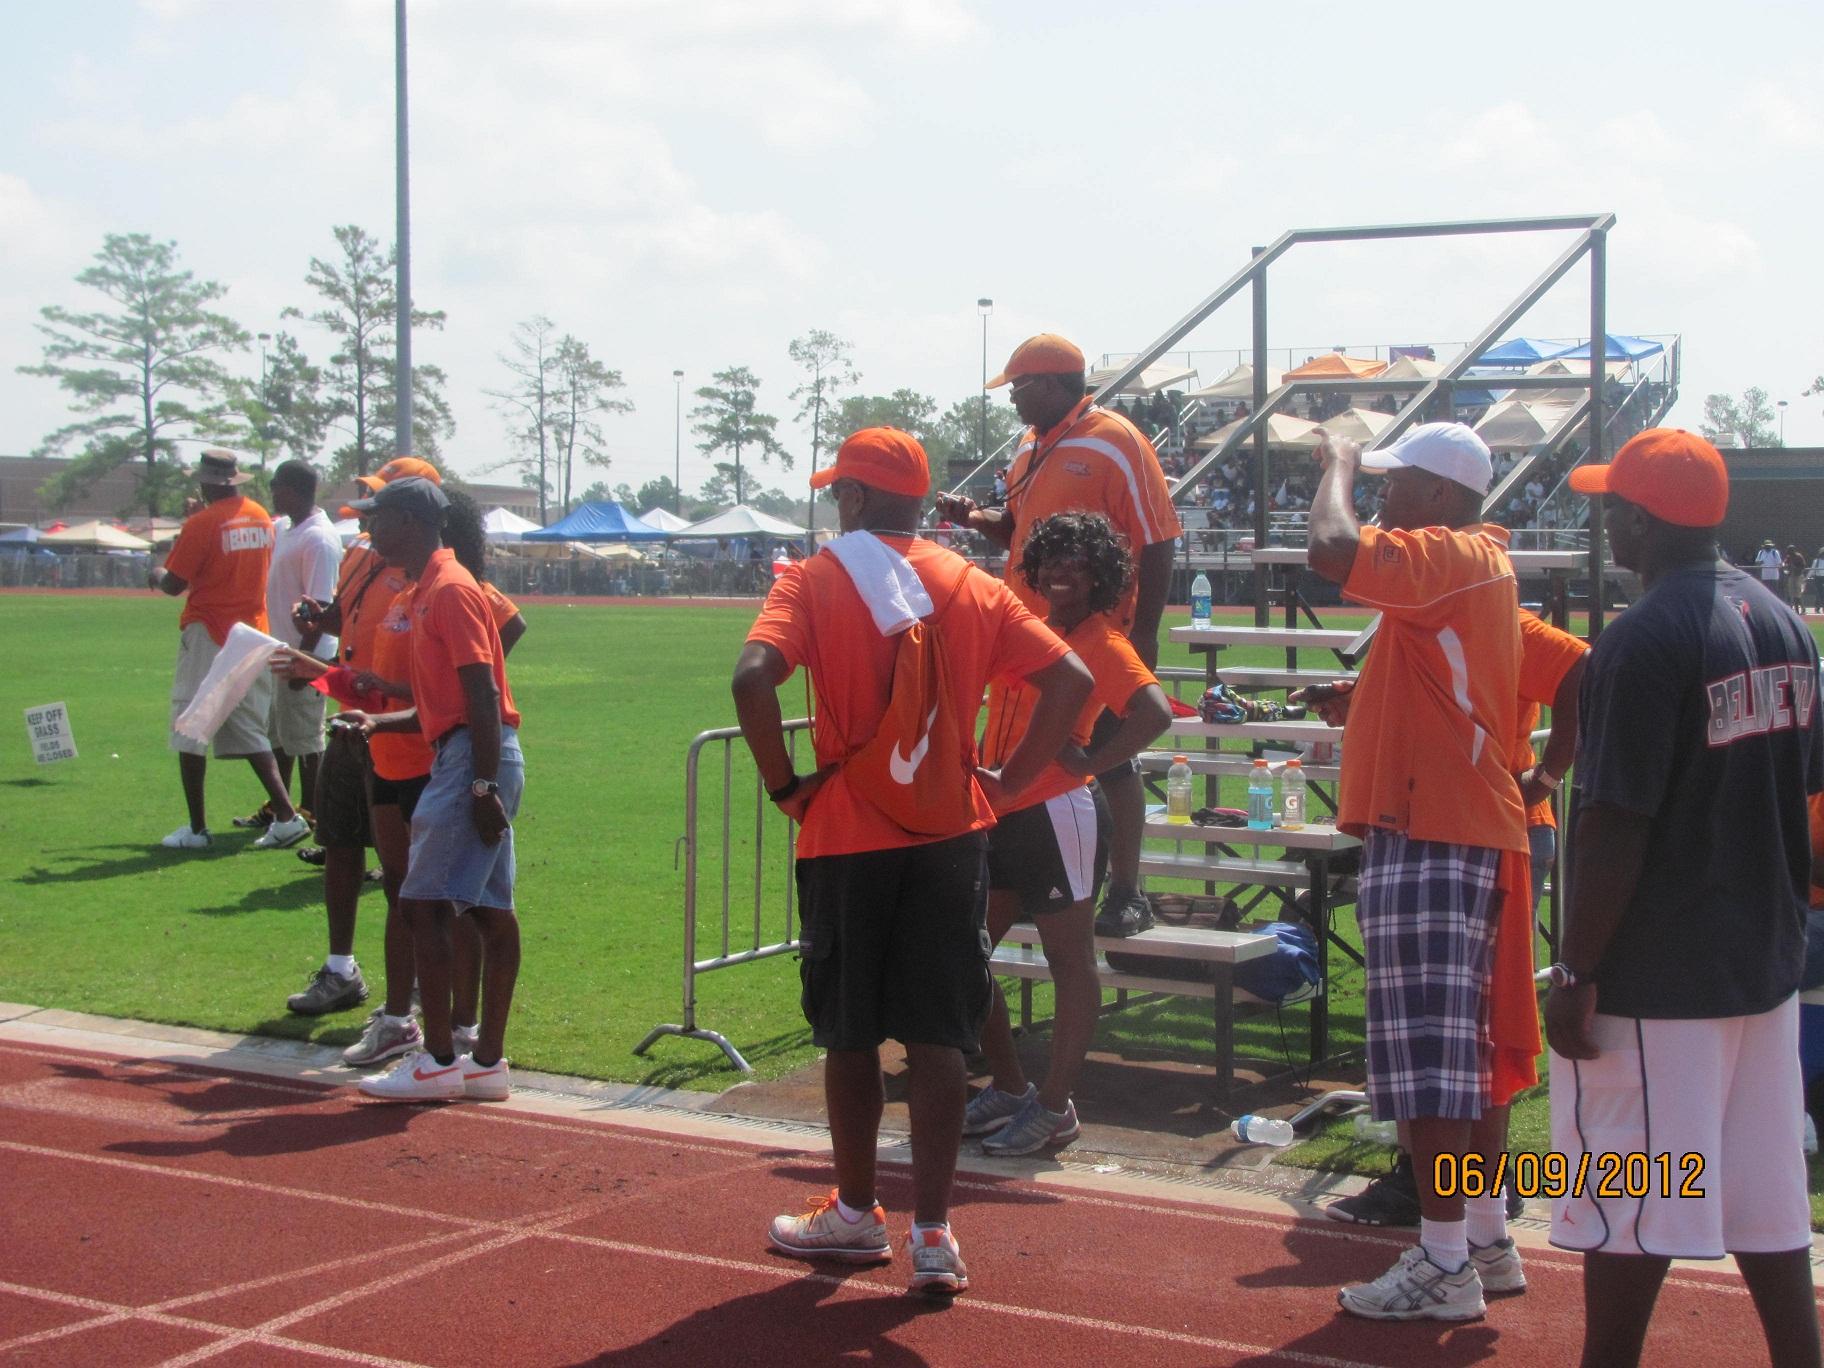 Sonics volunteers working the finish line